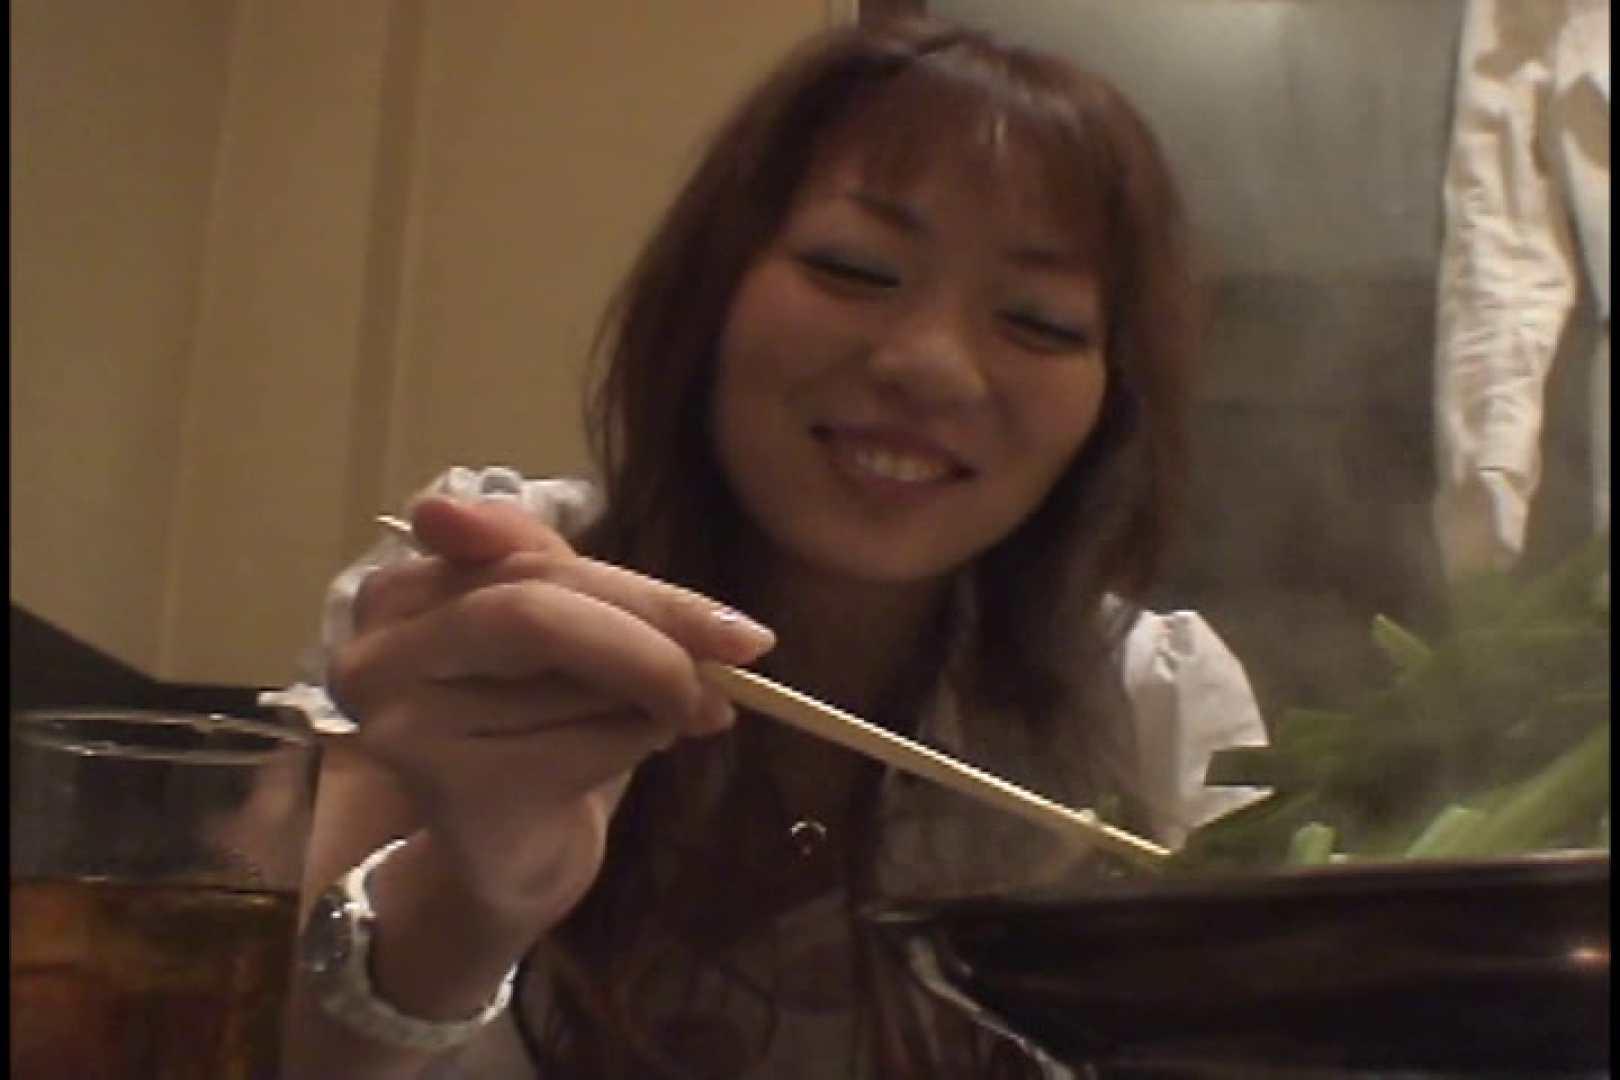 JDハンター全国ツアー vol.001 後編 女子大生のエロ動画   0  81PIX 5